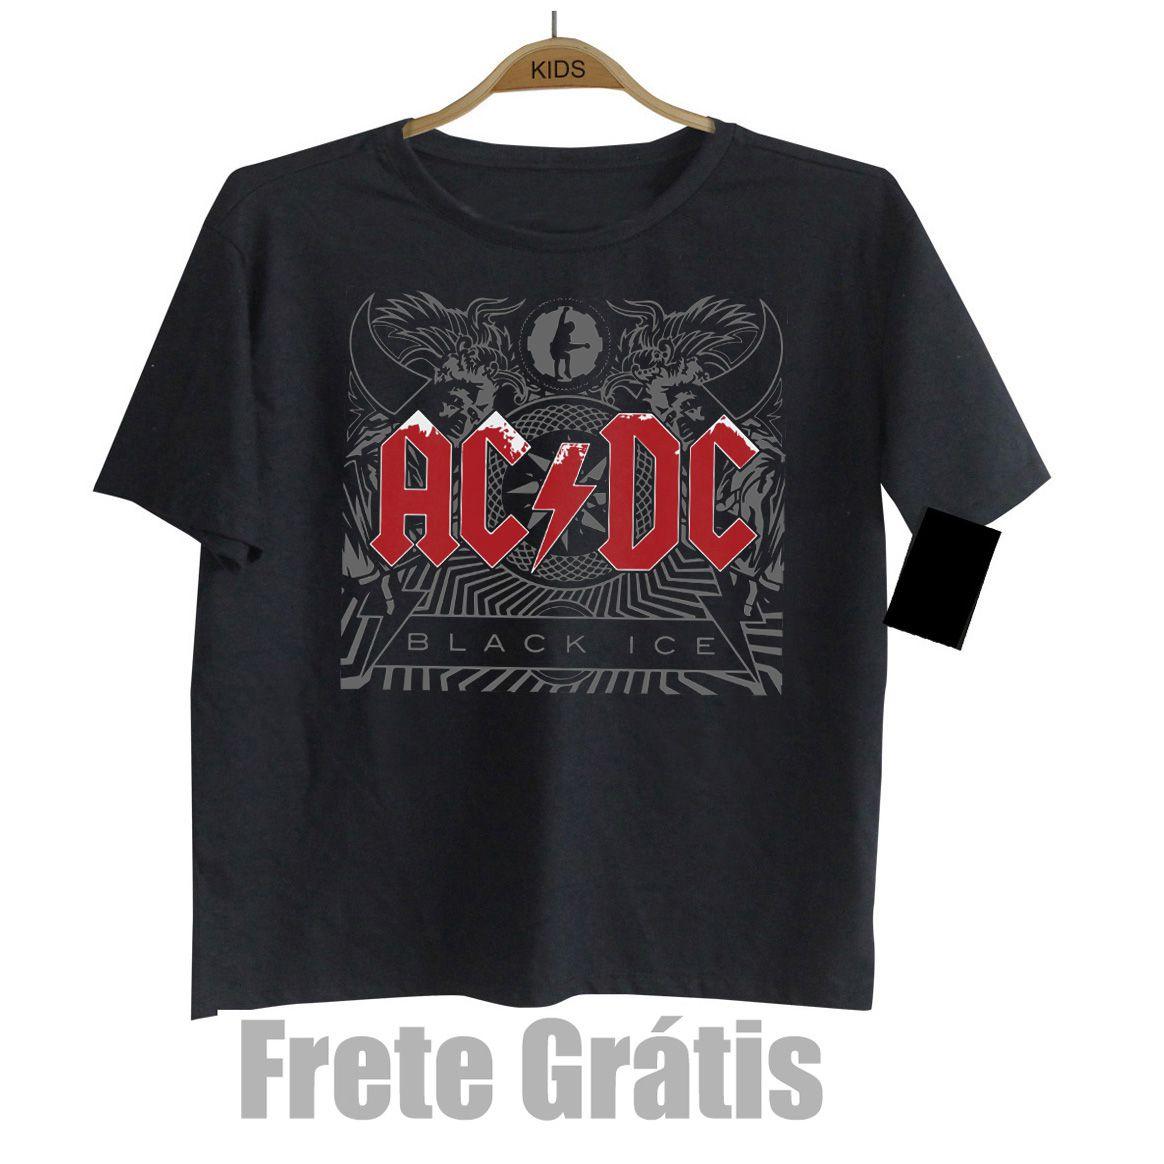 Camiseta Infantil  Rock Acdc - Black Ice   - Baby Monster S/A